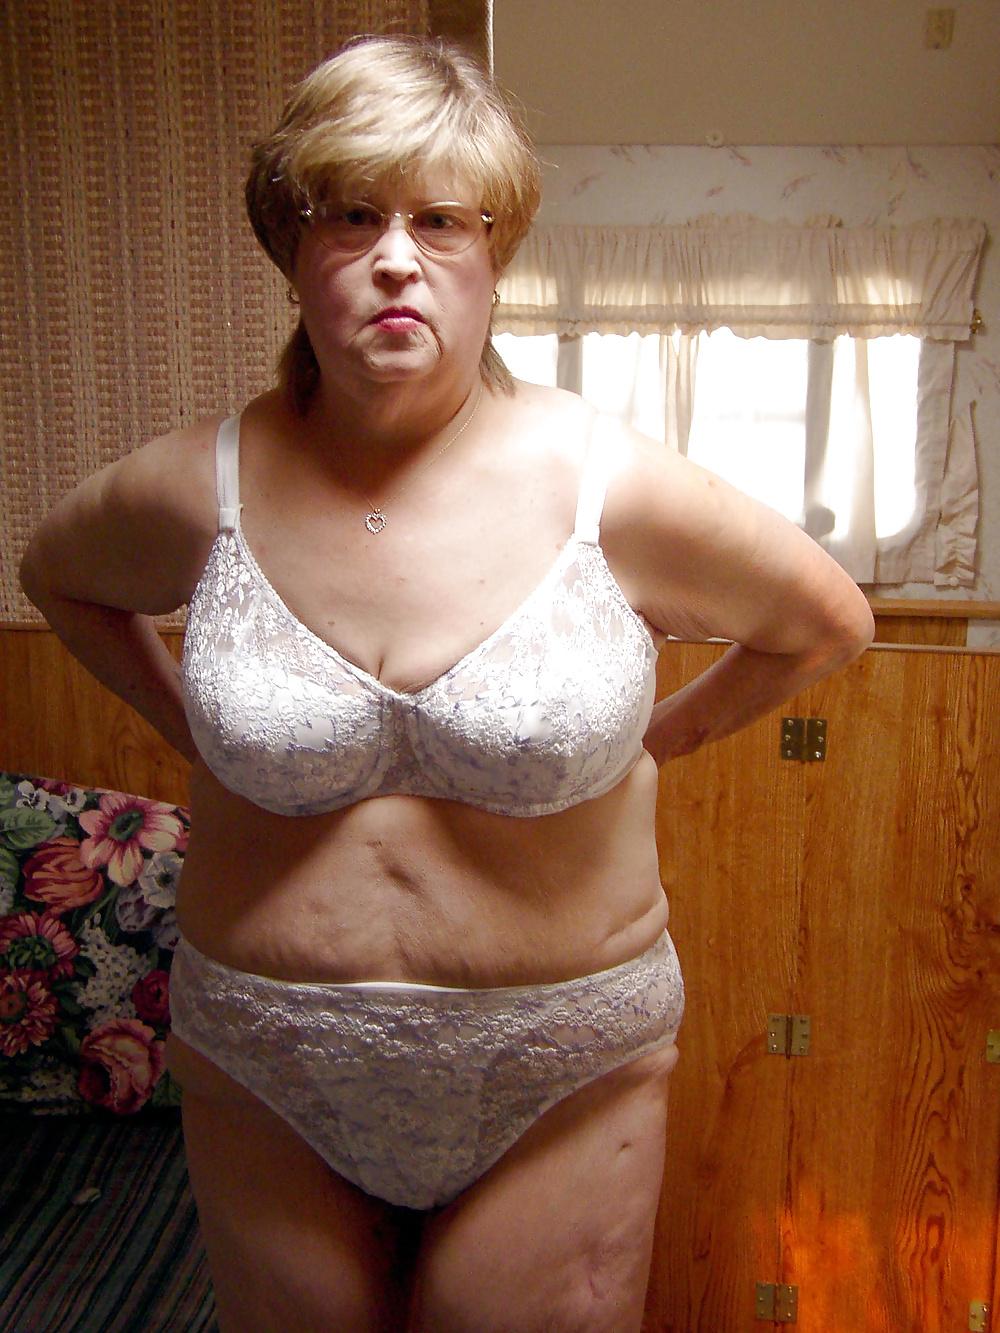 young-nude-grandma-susan-sarandon-legs